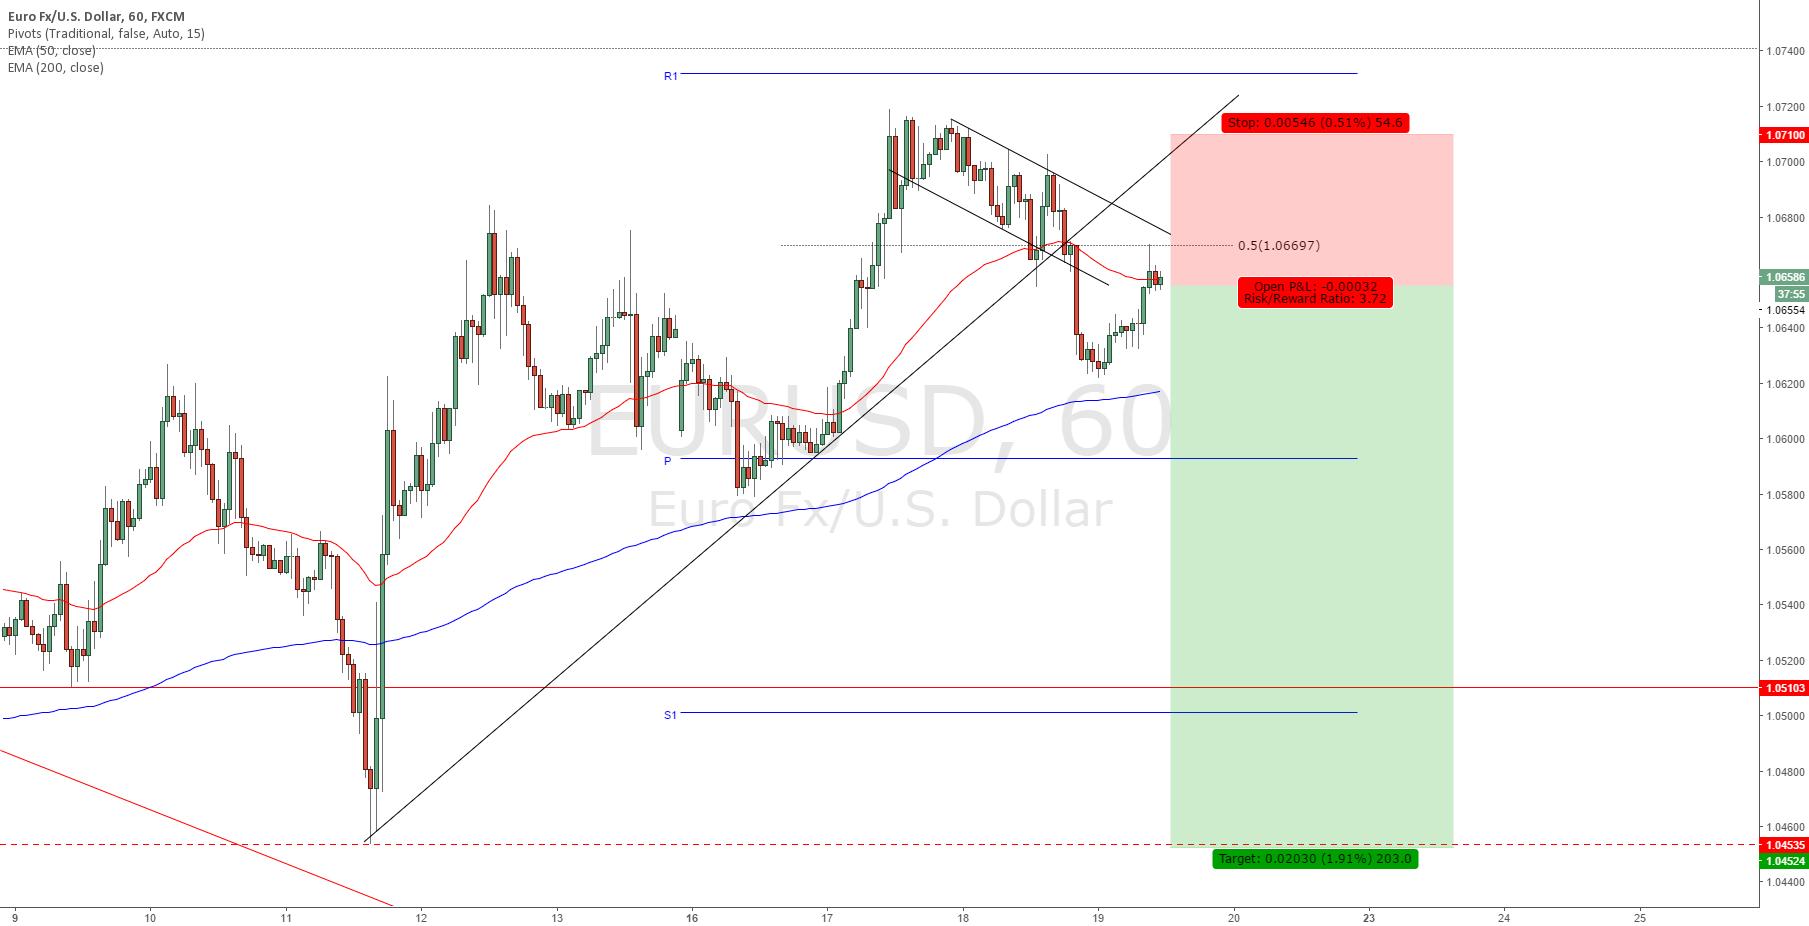 EURUSD - Return of the USD strength? Heading for 1.04500